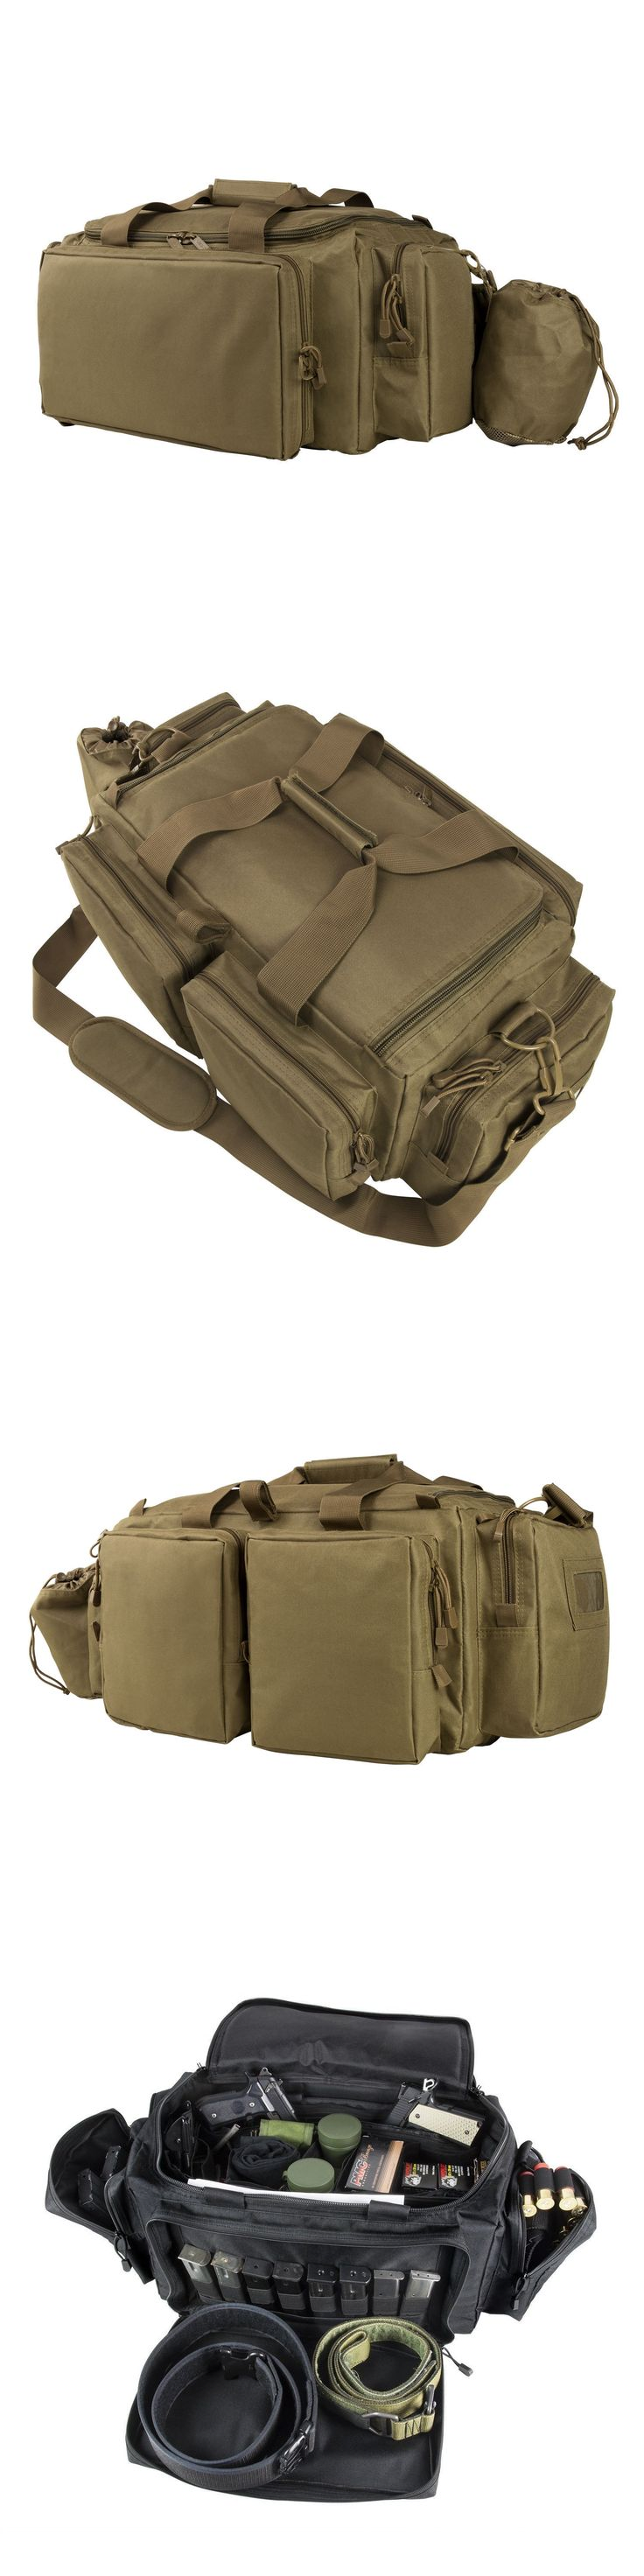 Range Gear 177905: Ncstar Cverb2930t Heavy Duty Tan Expert Professional Series Shooting Range Bag -> BUY IT NOW ONLY: $69.99 on eBay!